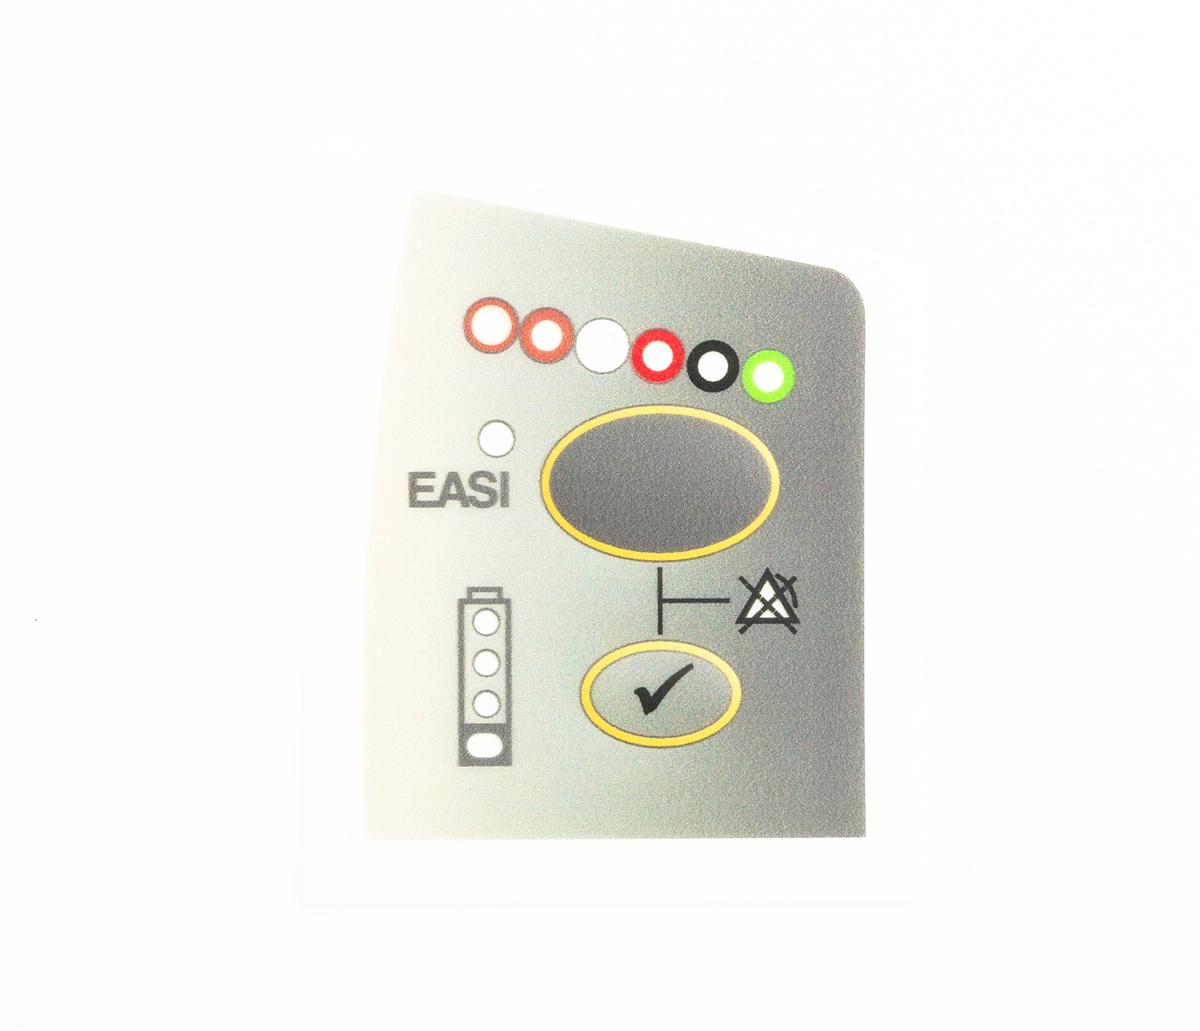 Philips IntelliVue M2601B Telemetry Transmitter S01 S02 S03 Front Case Overlay Label EASI ECG